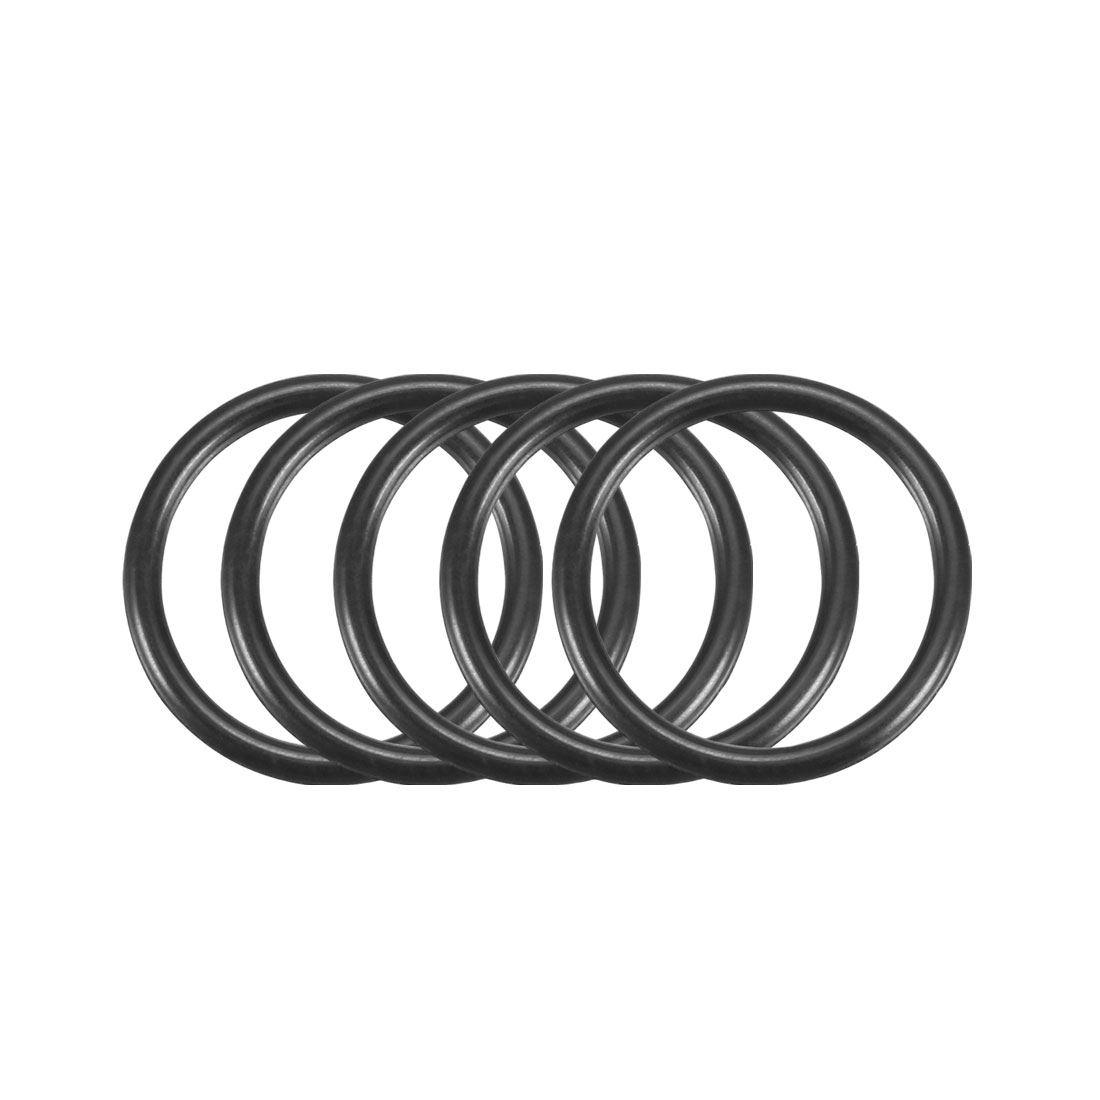 100Pcs Black 13mm x 1.2mm Nitrile Rubber O Ring NBR Oil Sealing Grommets